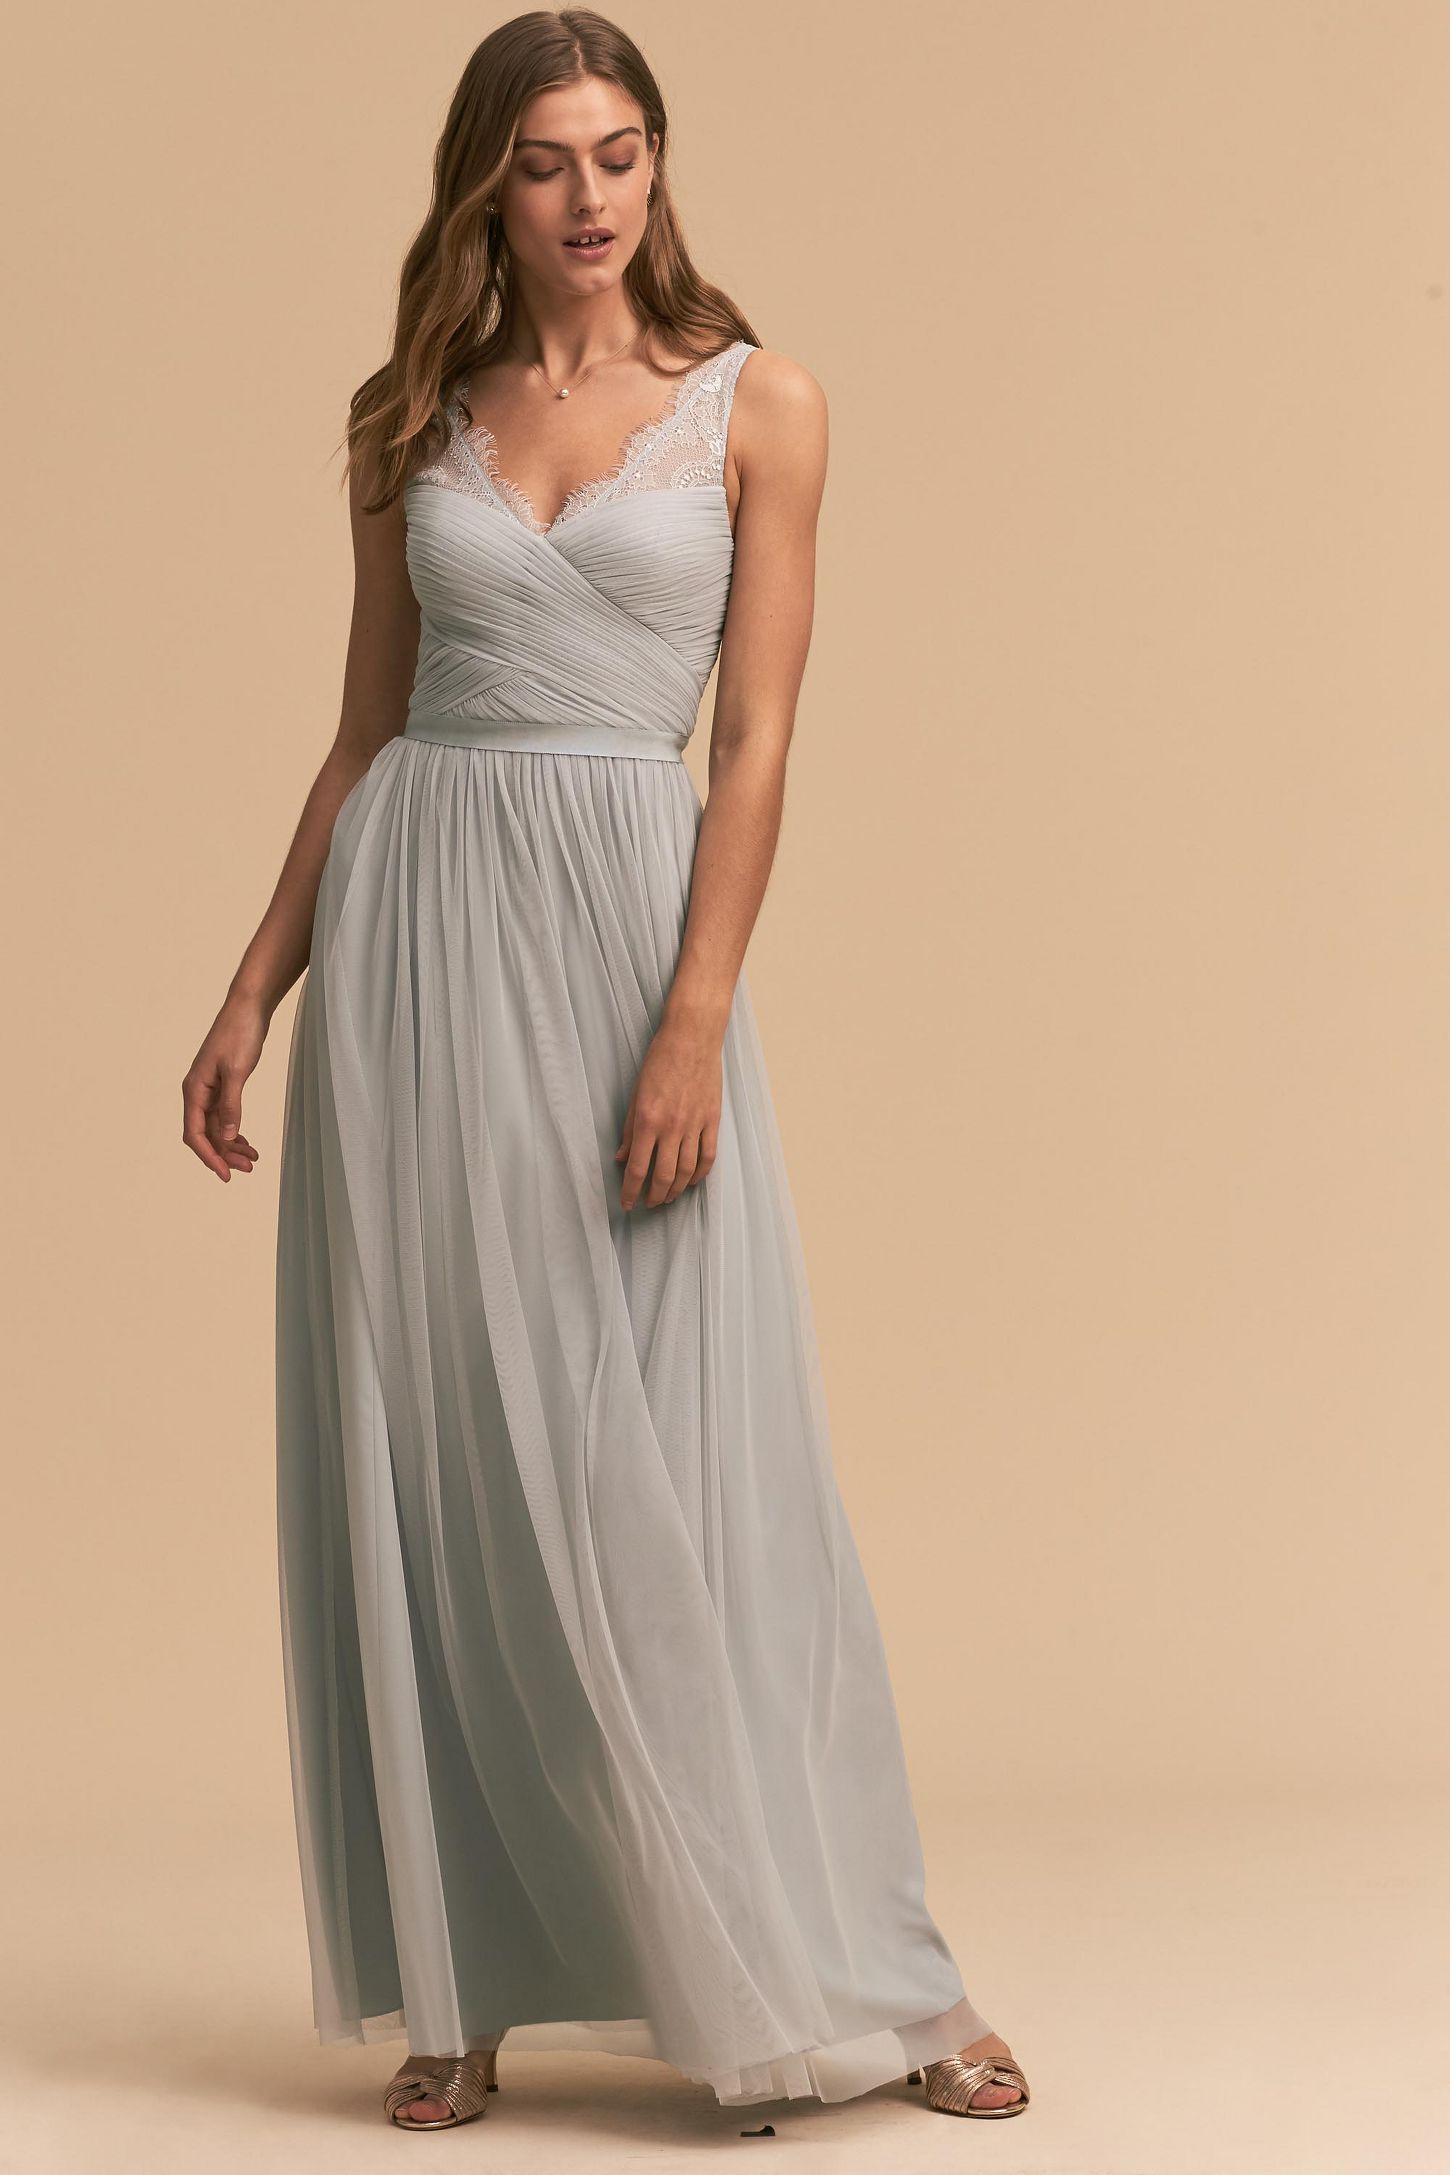 Silver wedding guest dresses anthropologie fleur dress junglespirit Image collections